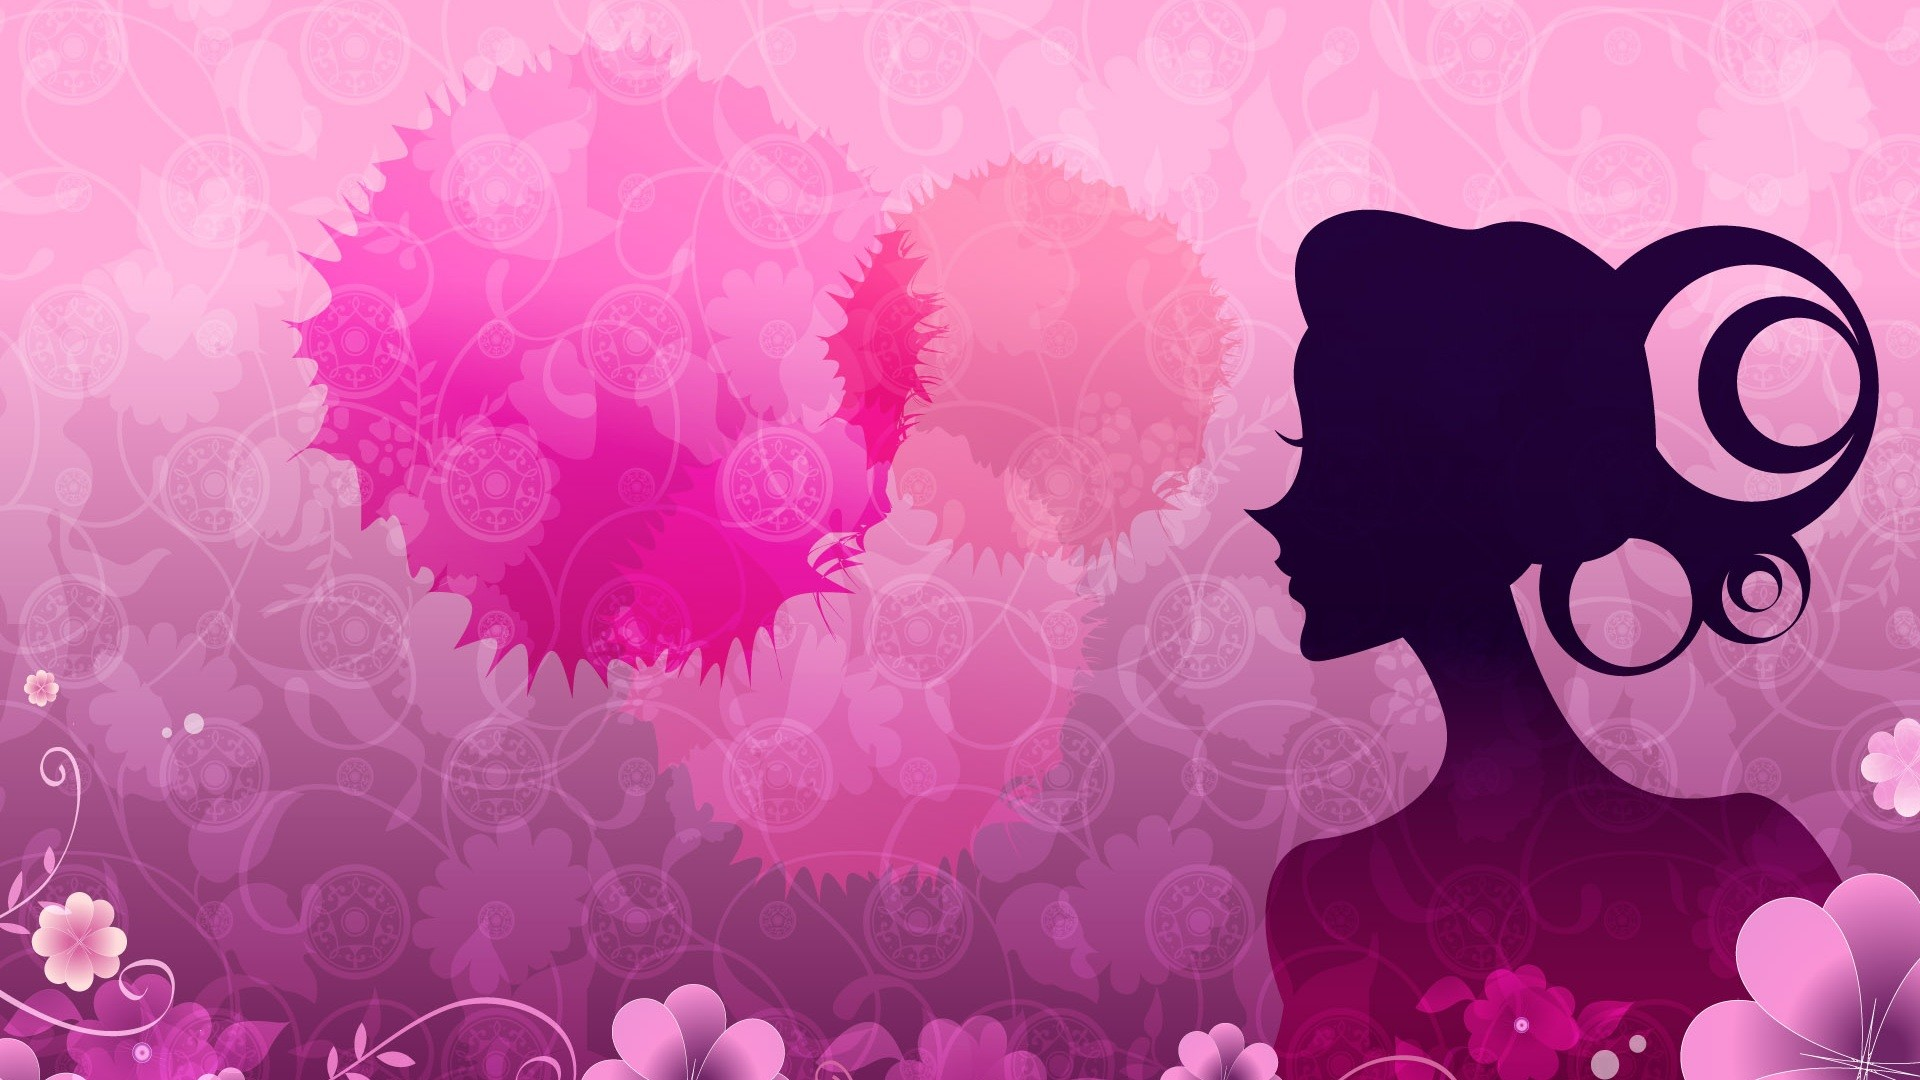 FunMozar – Cool & Cute Girly Wallpapers